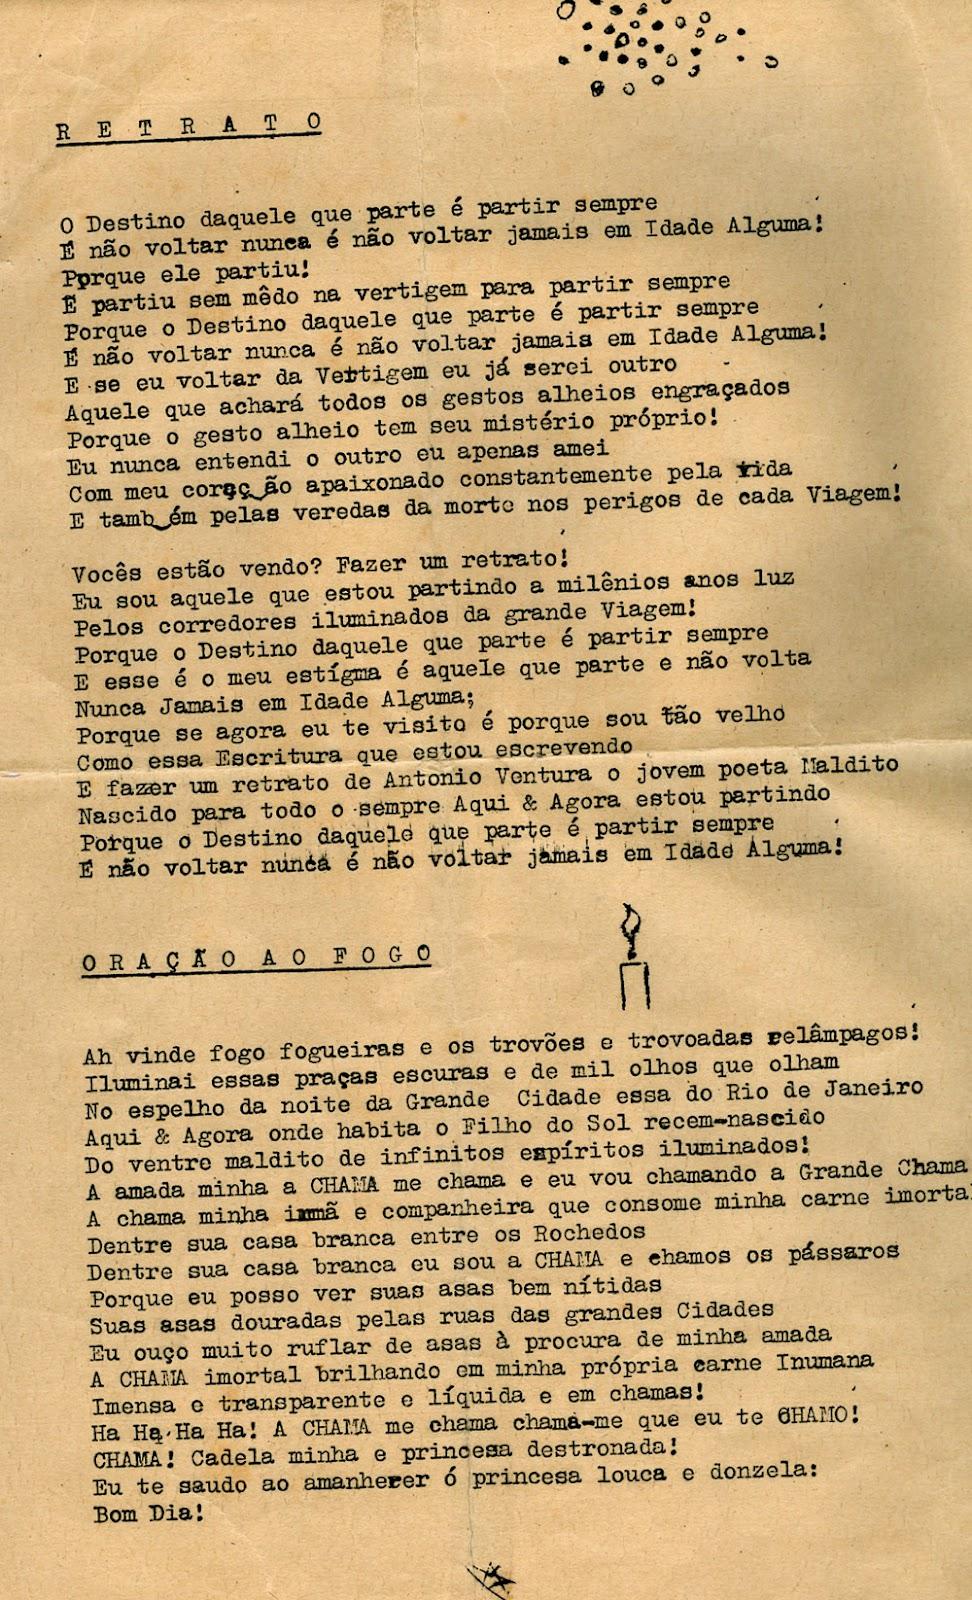 poemas mimeografados